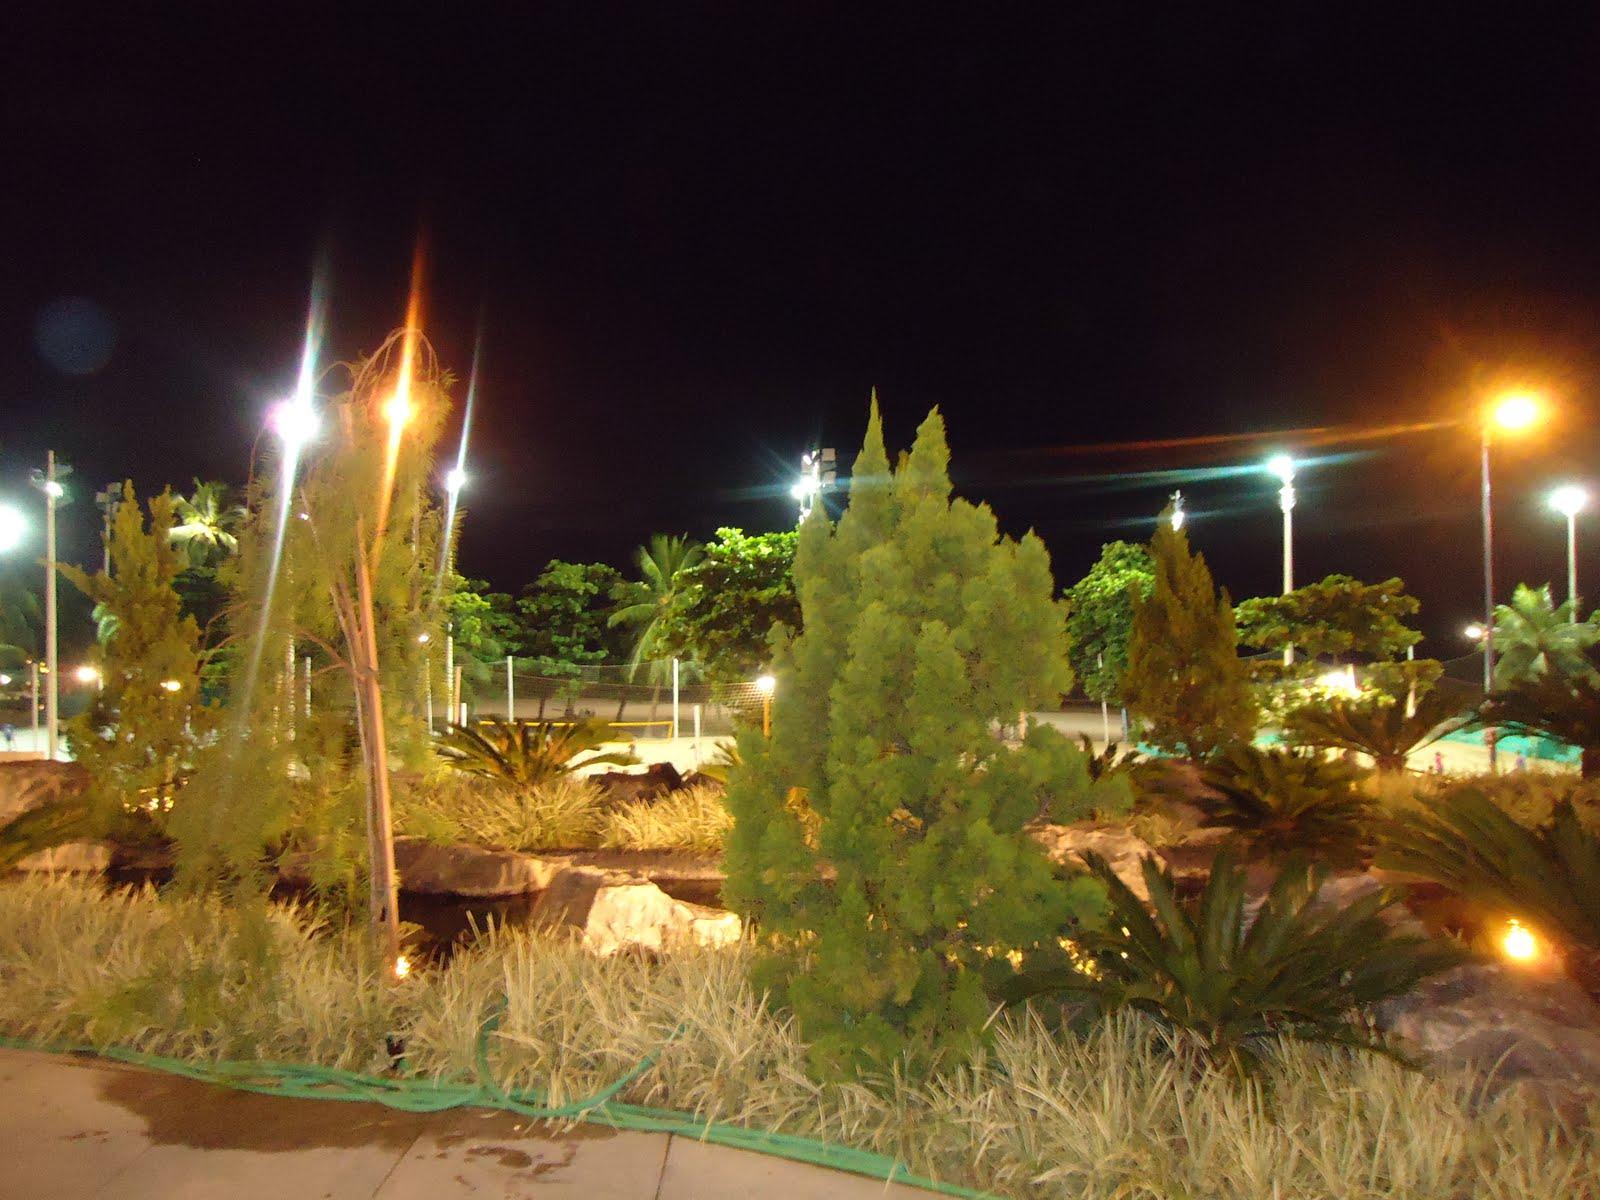 fotos do jardim japones em fortaleza:Blog do Cristiano Goes: JARDIM JAPONÊS – FORTALEZA